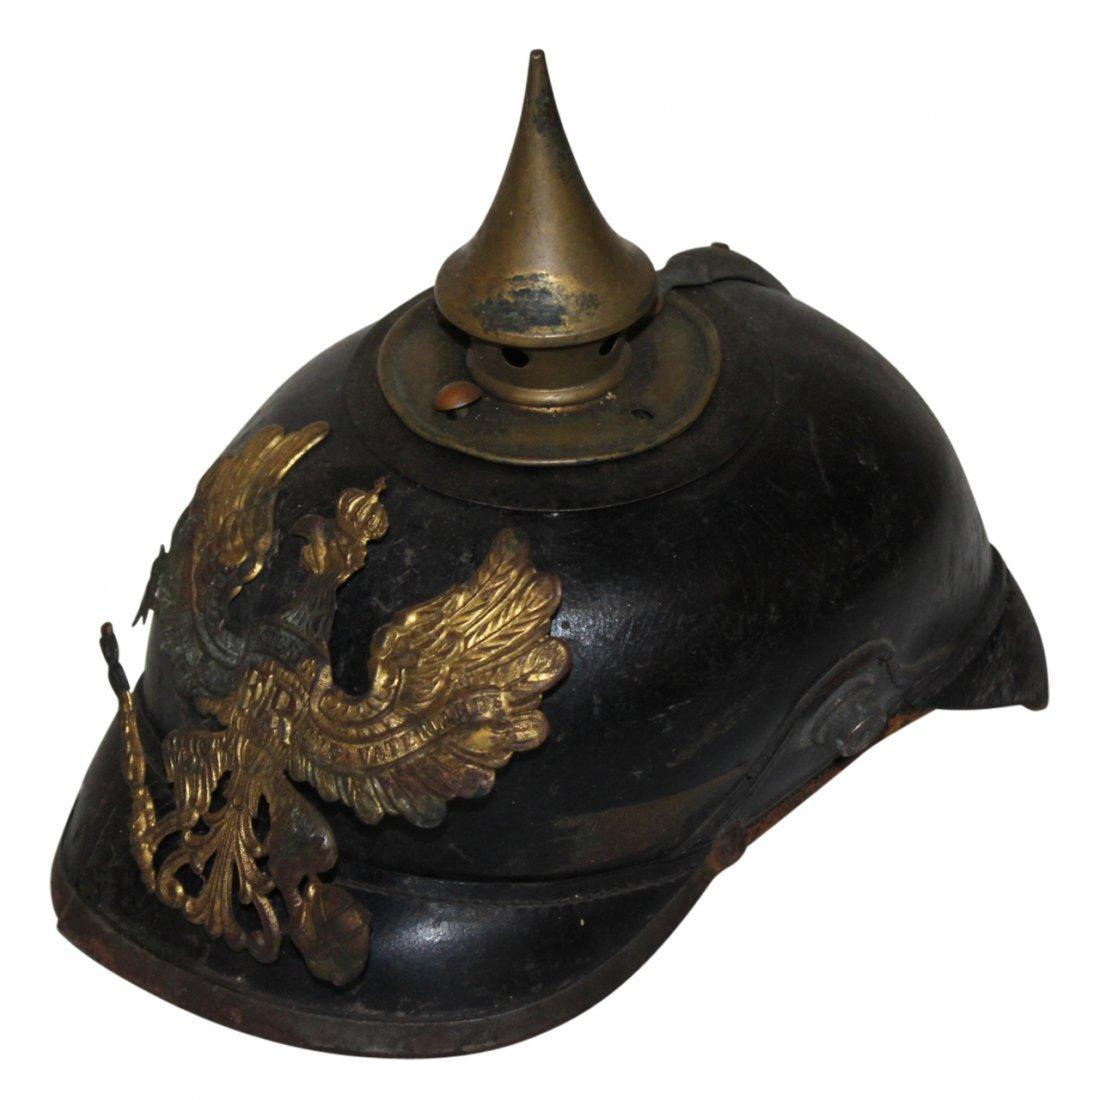 Antique German Prussian Helmet